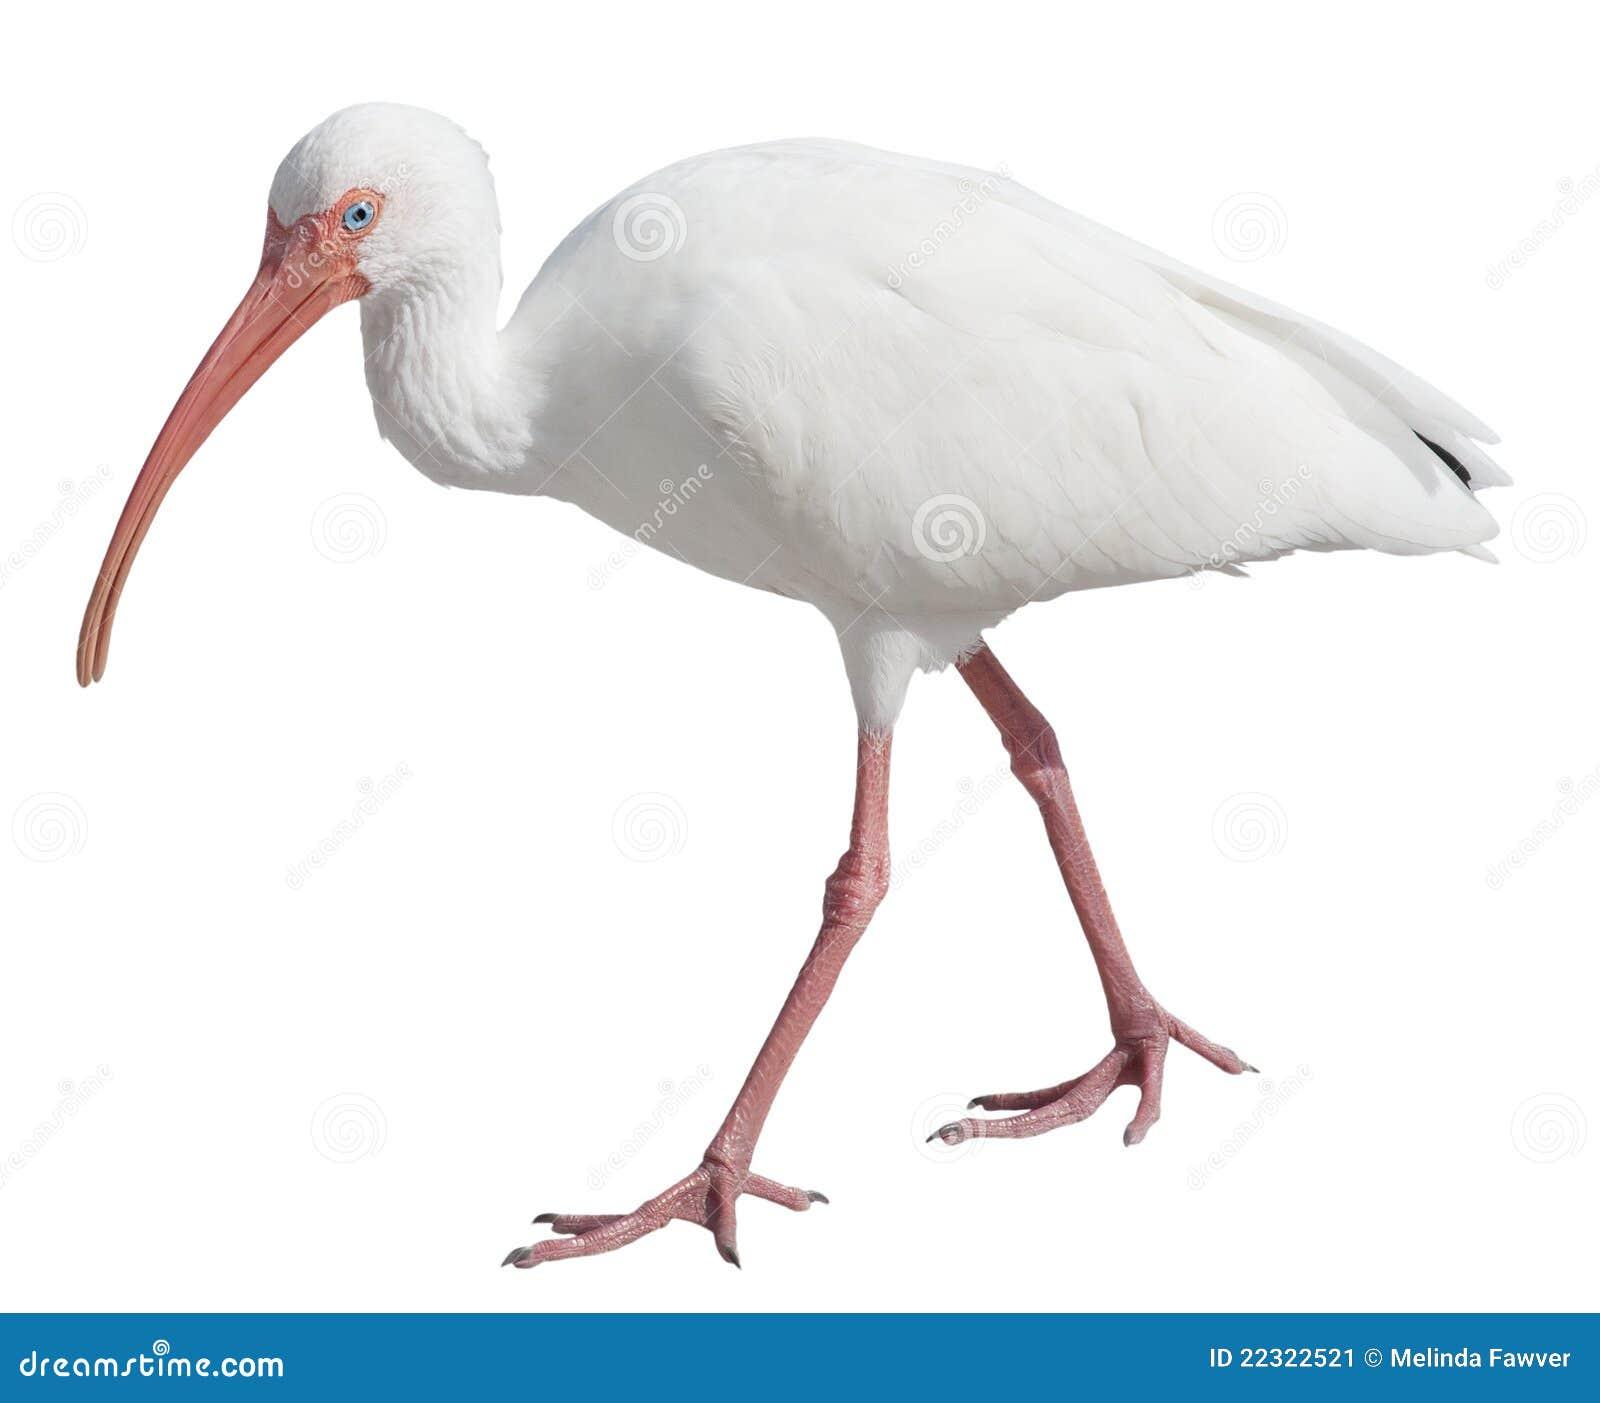 American White Ibis (Eudocimus albus) on a white background with ...